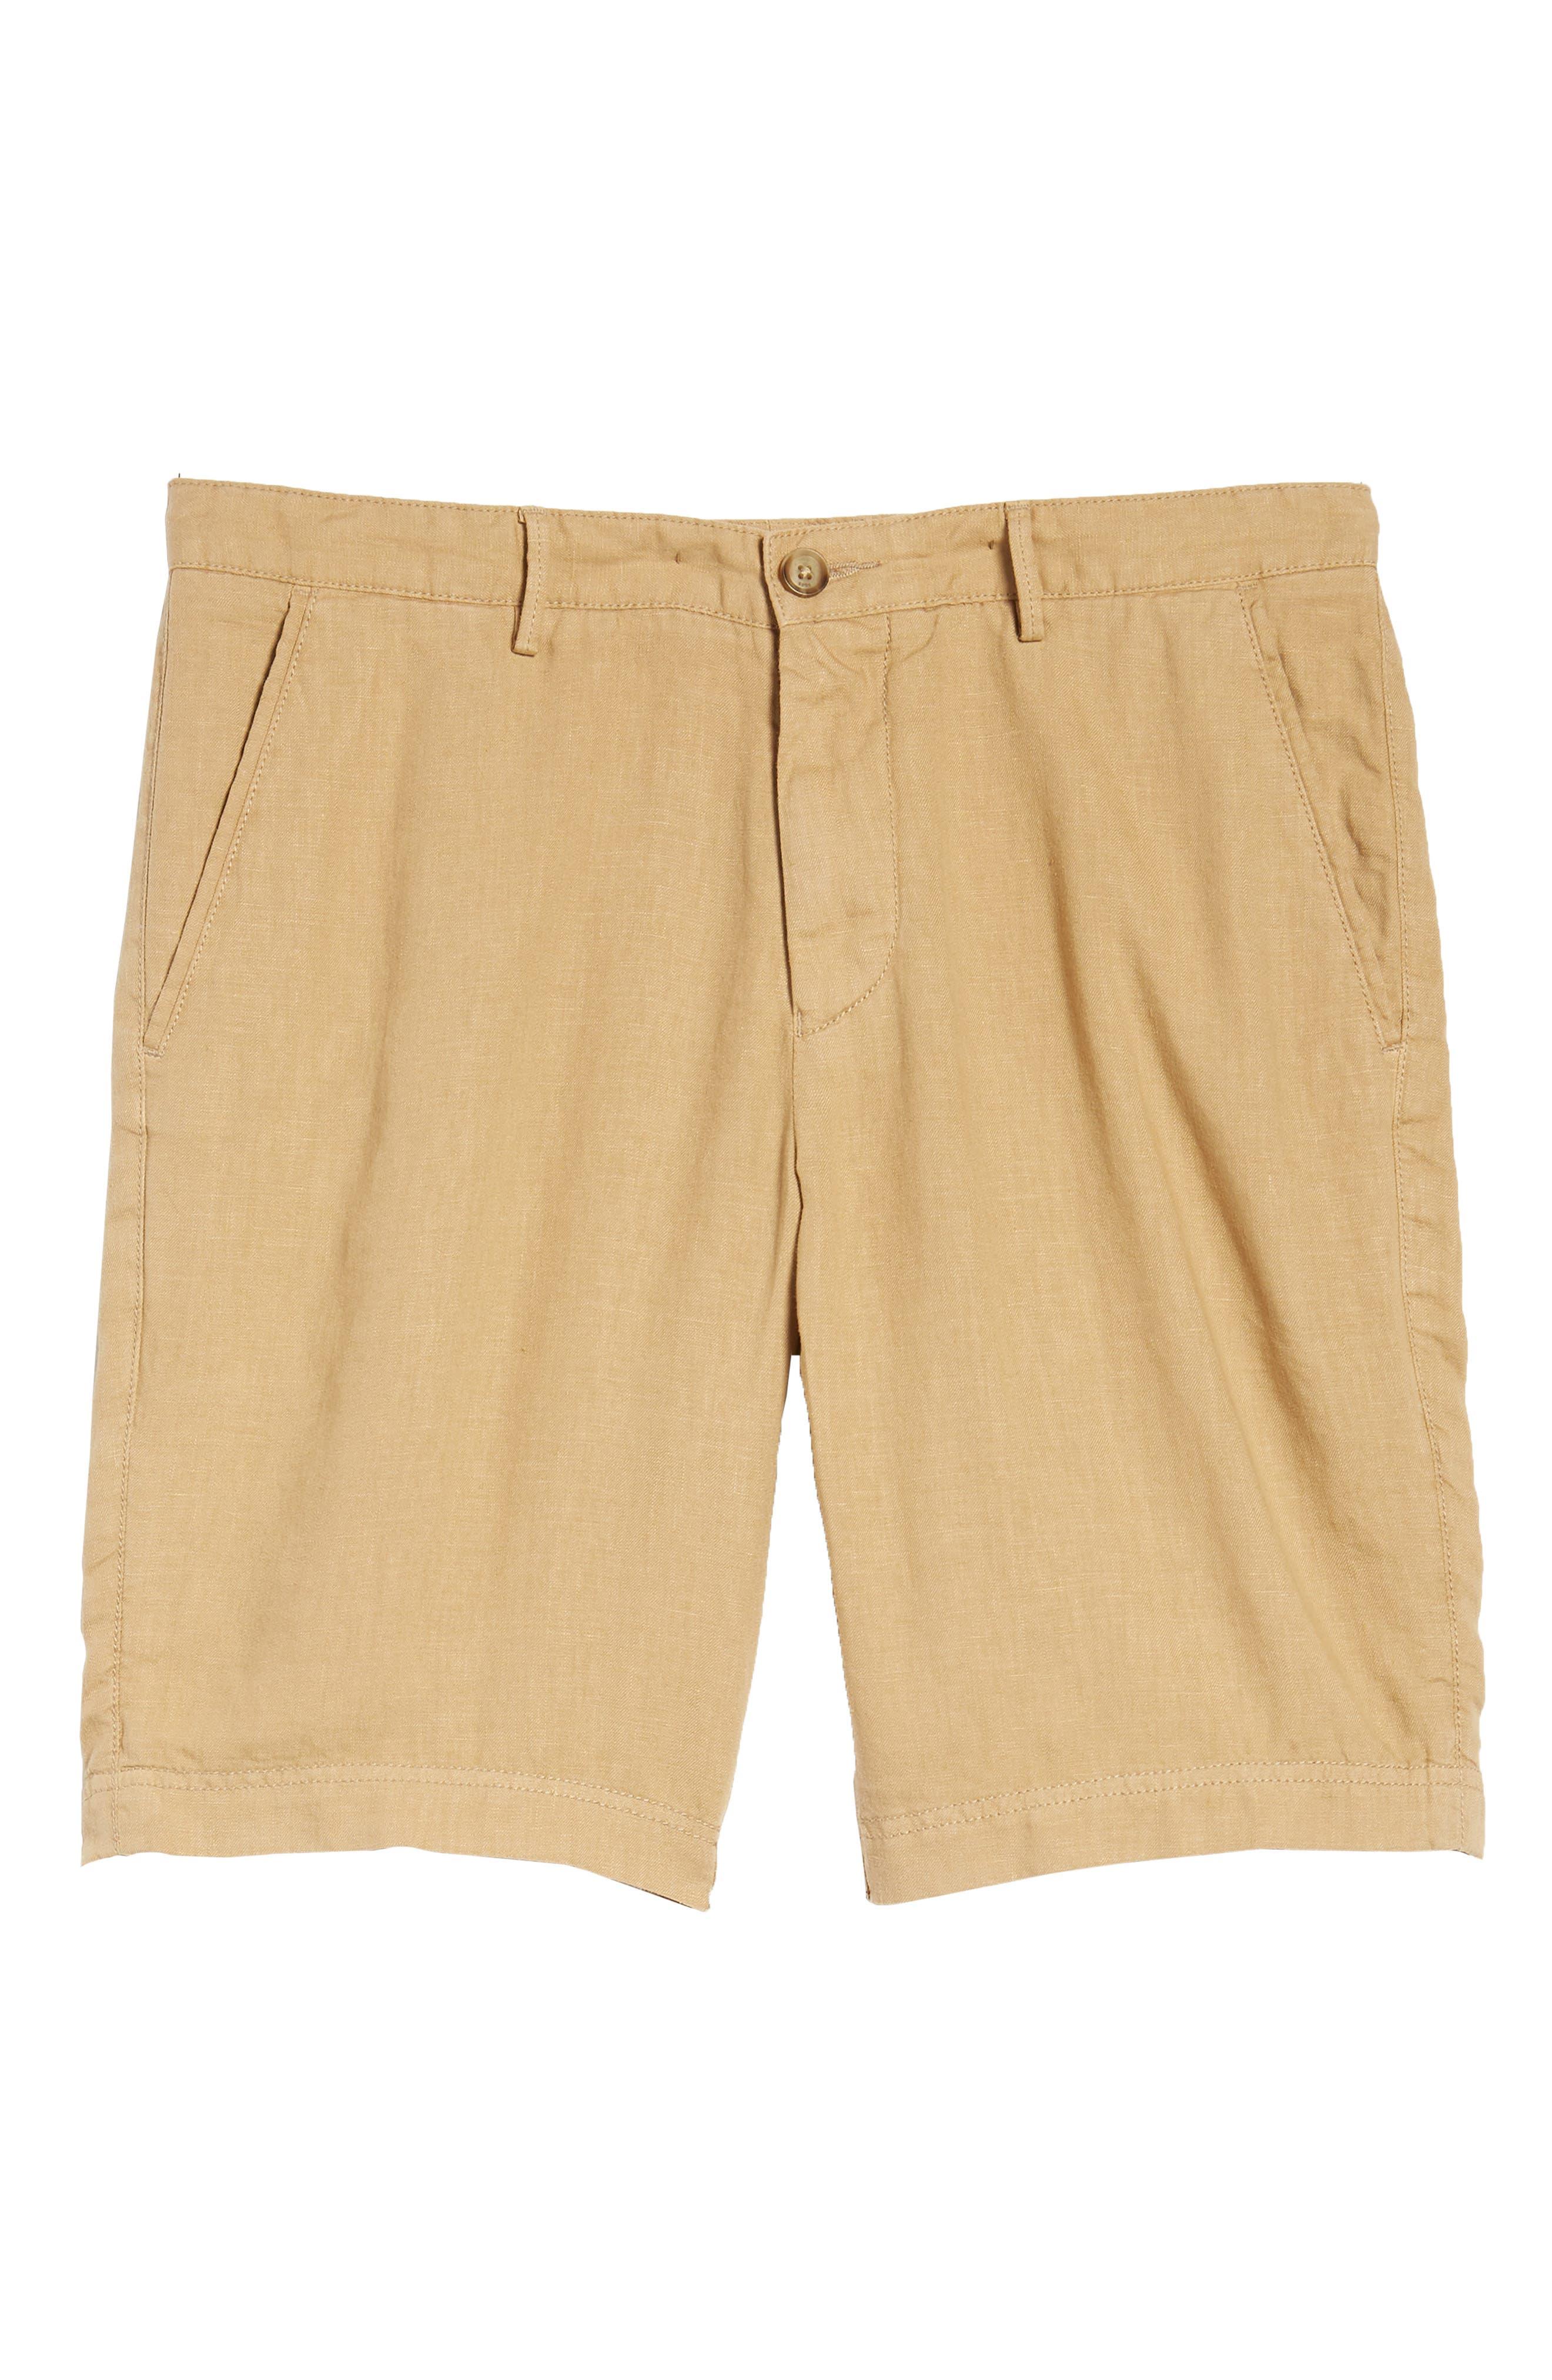 Crigan Linen Shorts,                             Alternate thumbnail 29, color,